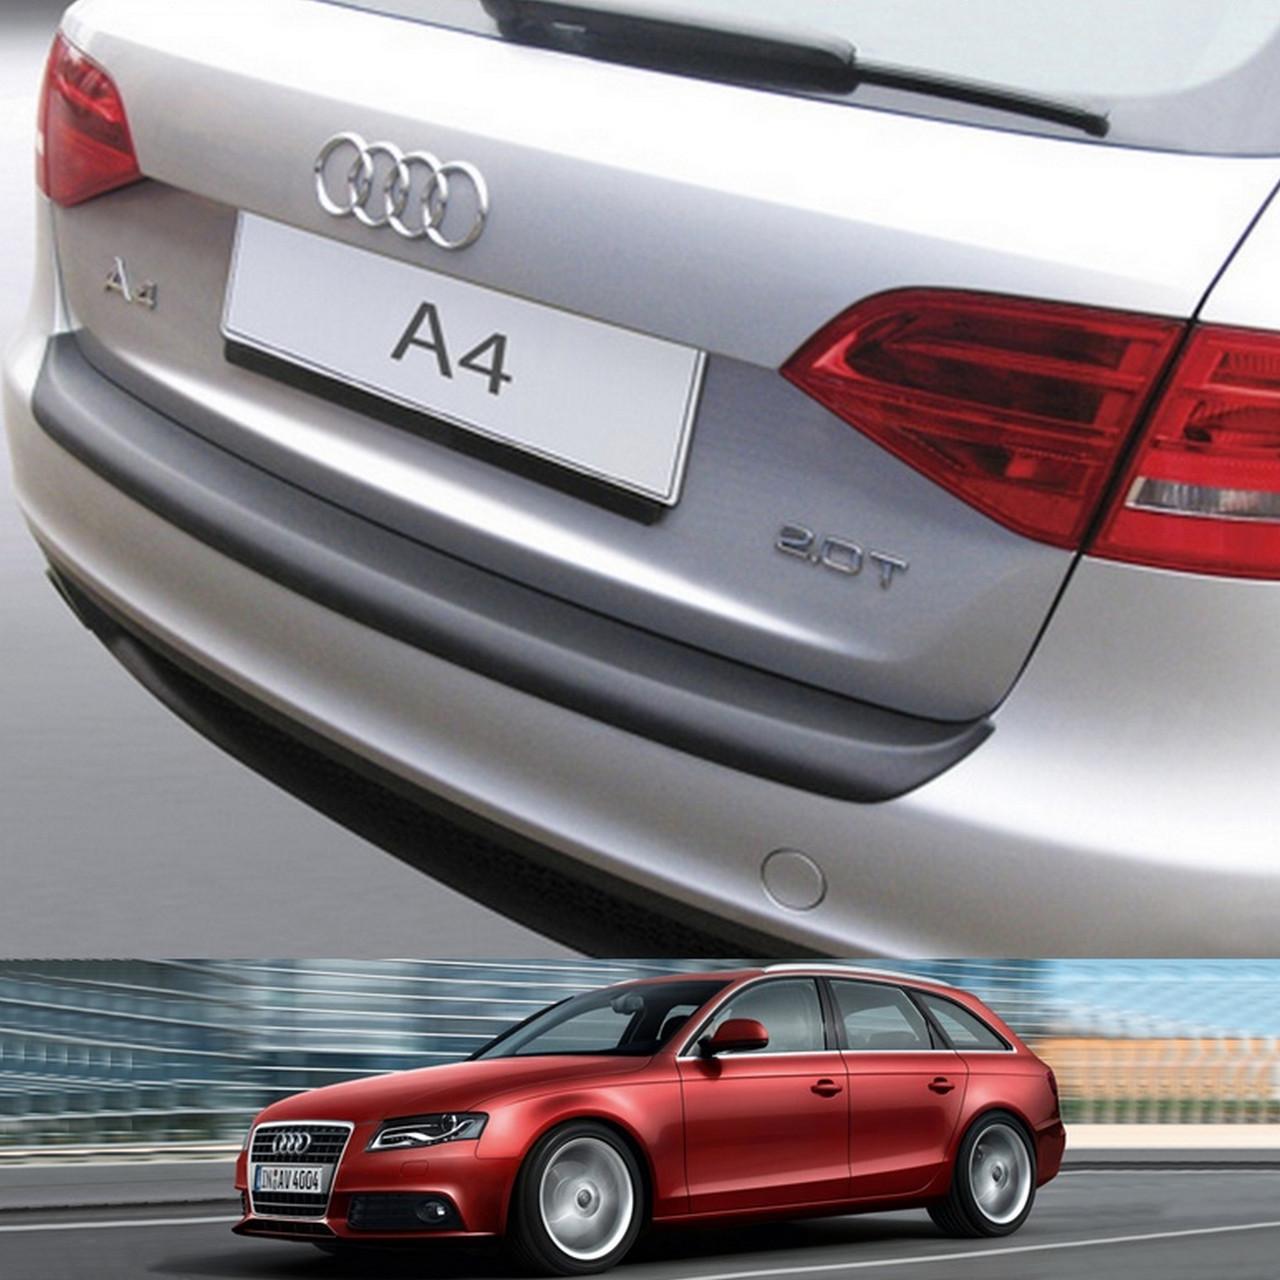 Пластиковая защитная накладка на задний бампер для Audi A4 Avant 2008-2012